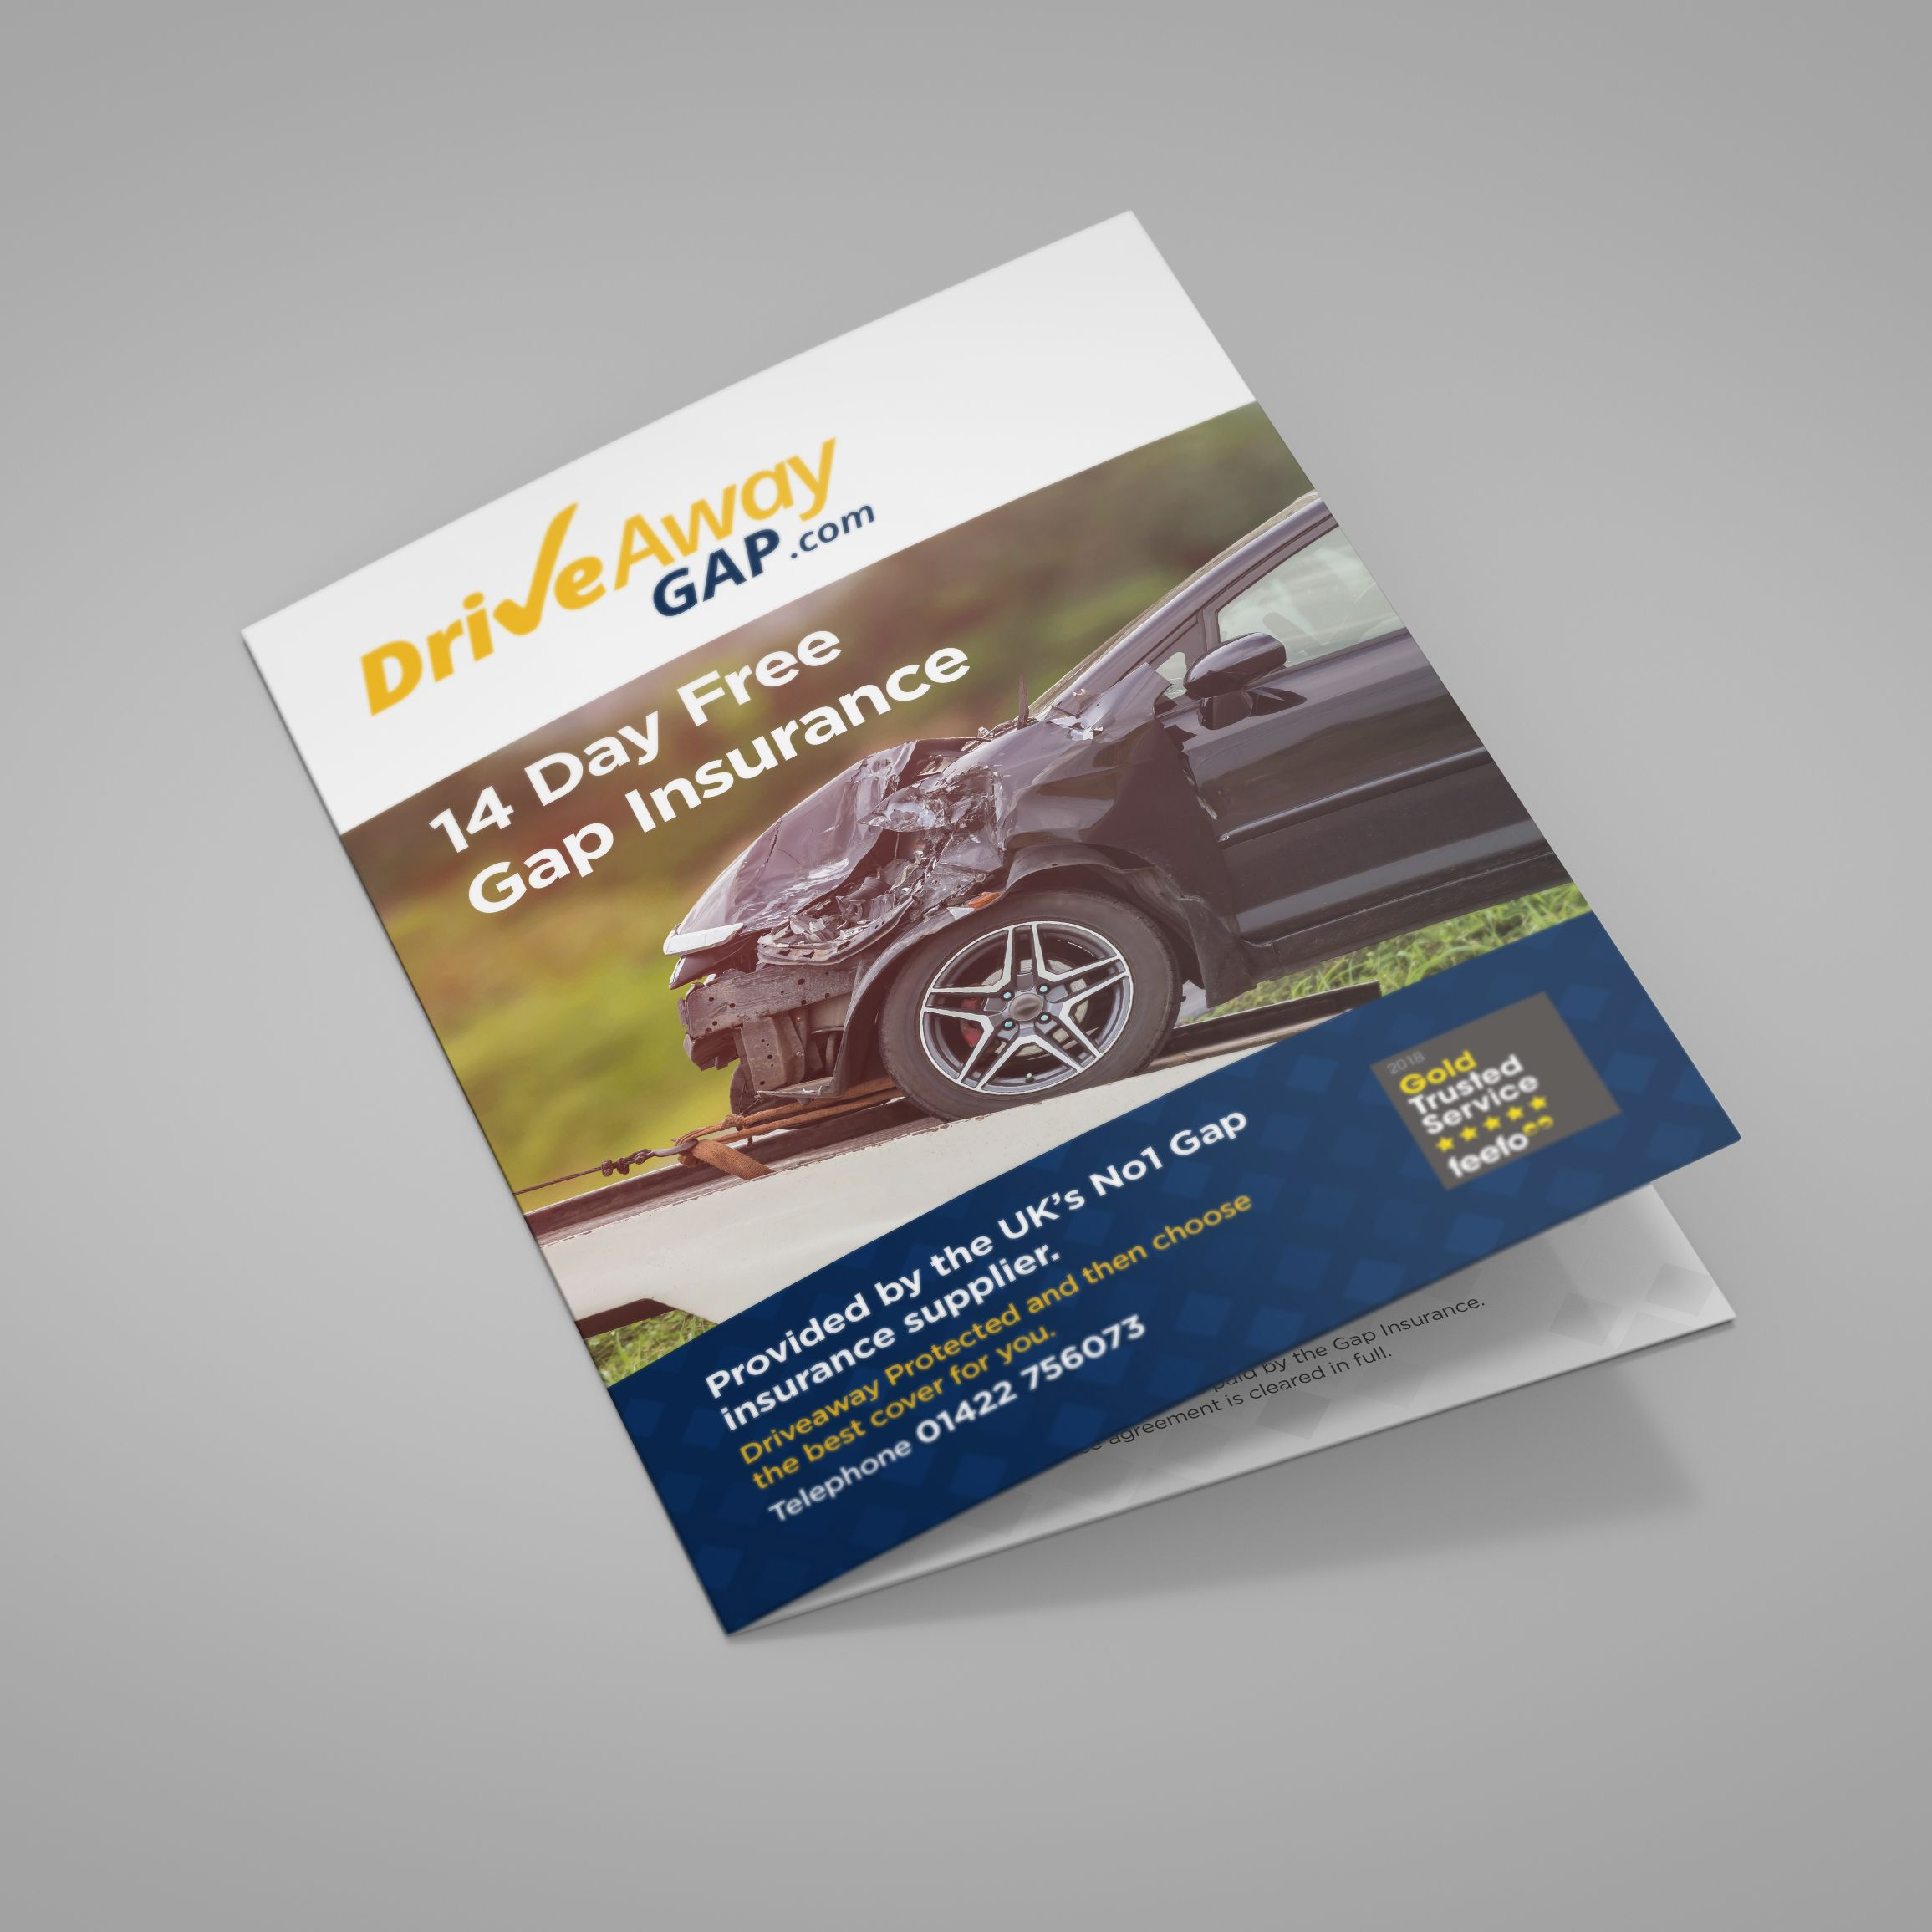 Driveaway Motor Insurance Car Insurance Insurance